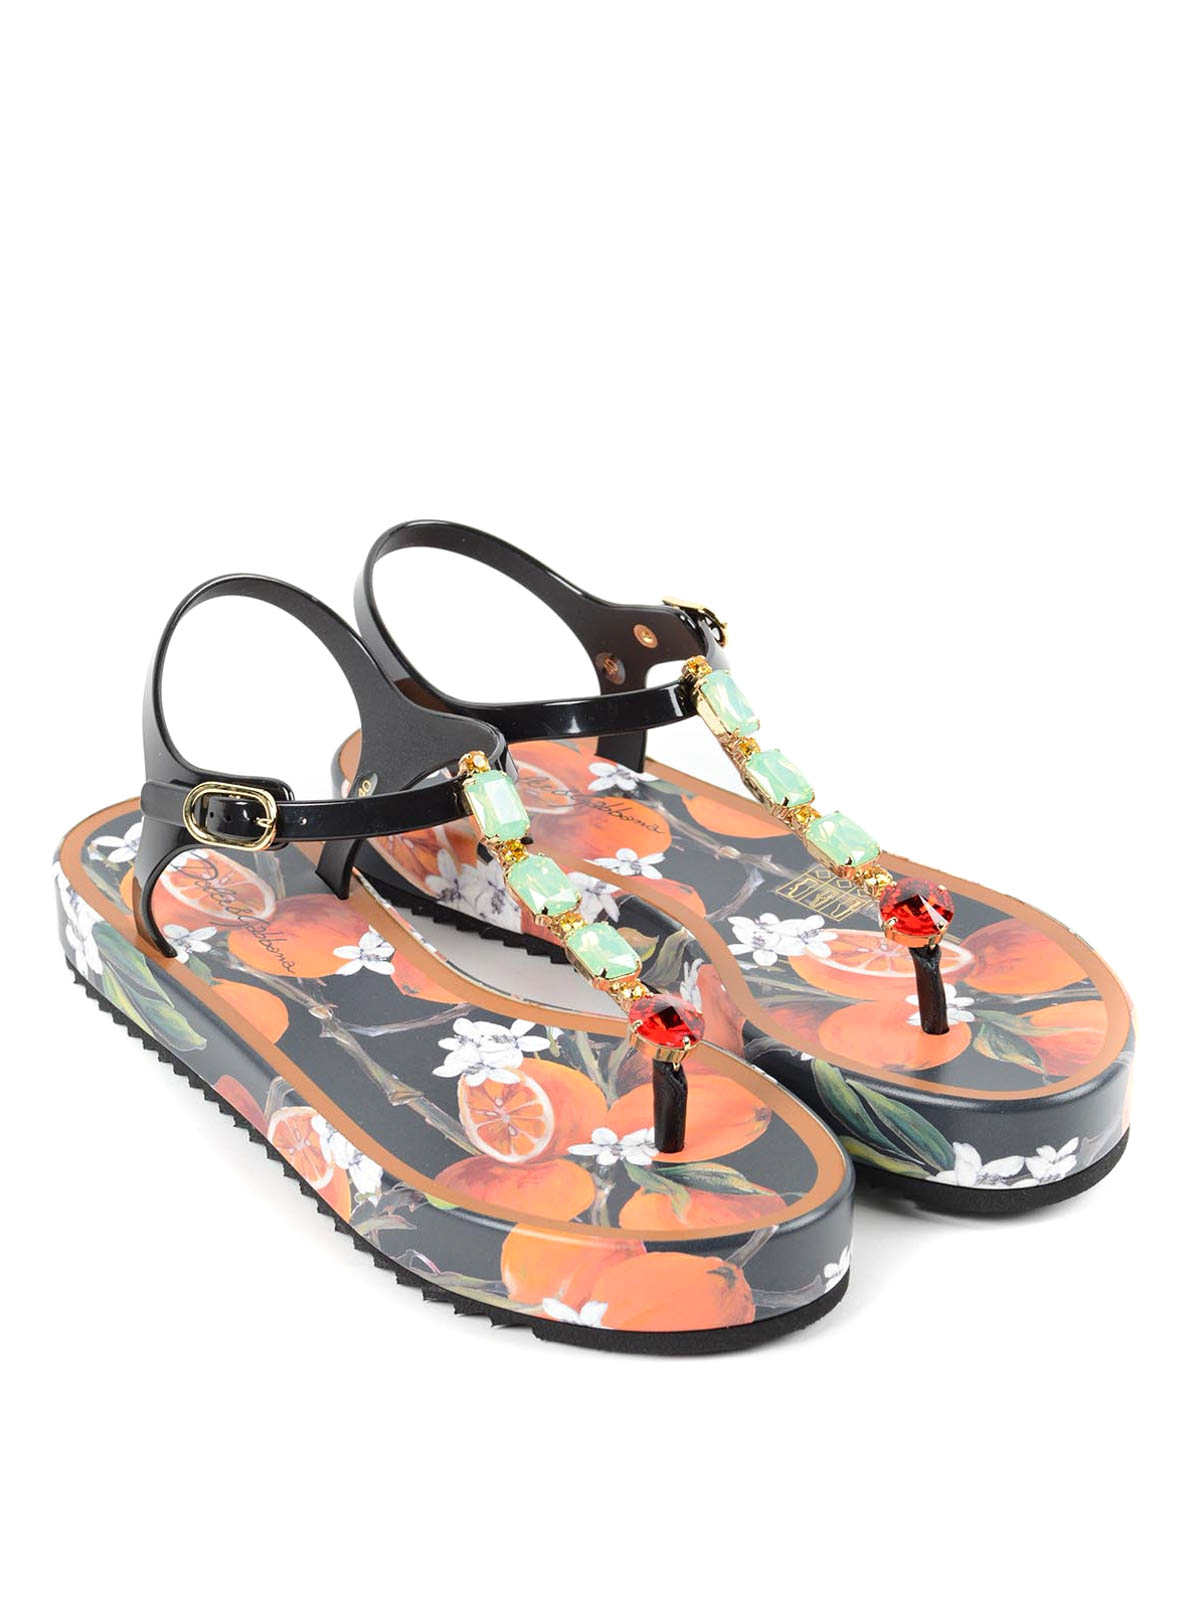 56fa45ca134526 Dolce   Gabbana - Beachwear sandals - flip flops - CW0035 A4374 80999